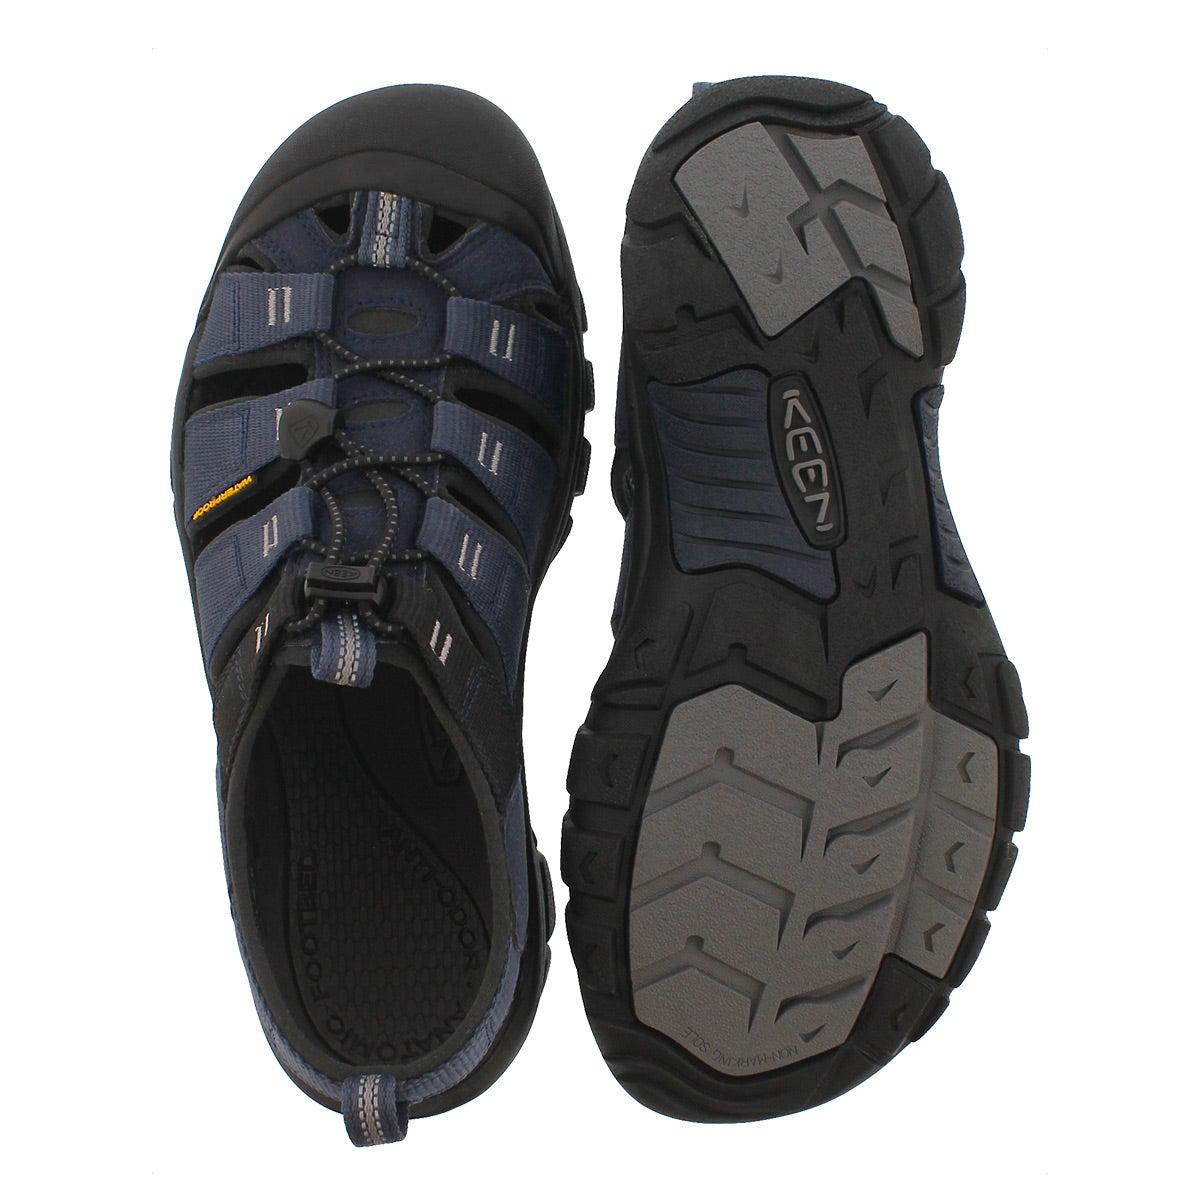 Mens Newport Hydro blu/gry sport sandal